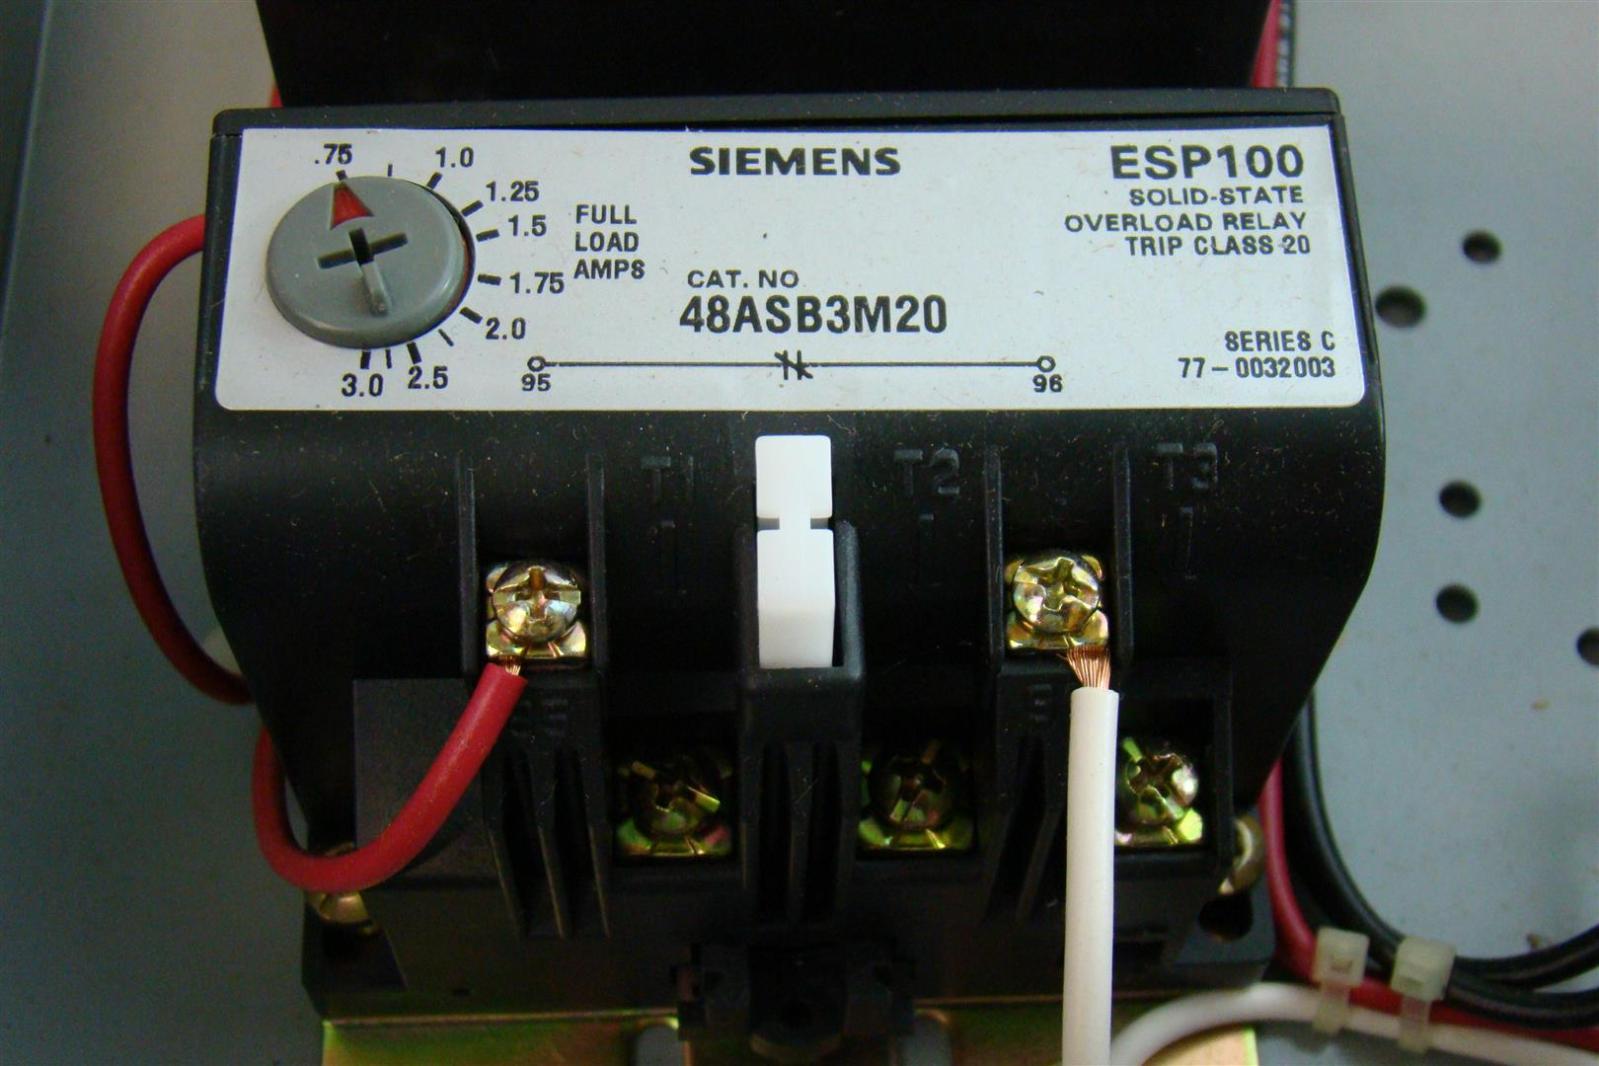 Siemens heavy duty motor starter class 14 magnetic starter 3ph 200 siemens heavy duty motor starter class 14 magnetic starter 3ph 200230vac maxamp cheapraybanclubmaster Image collections